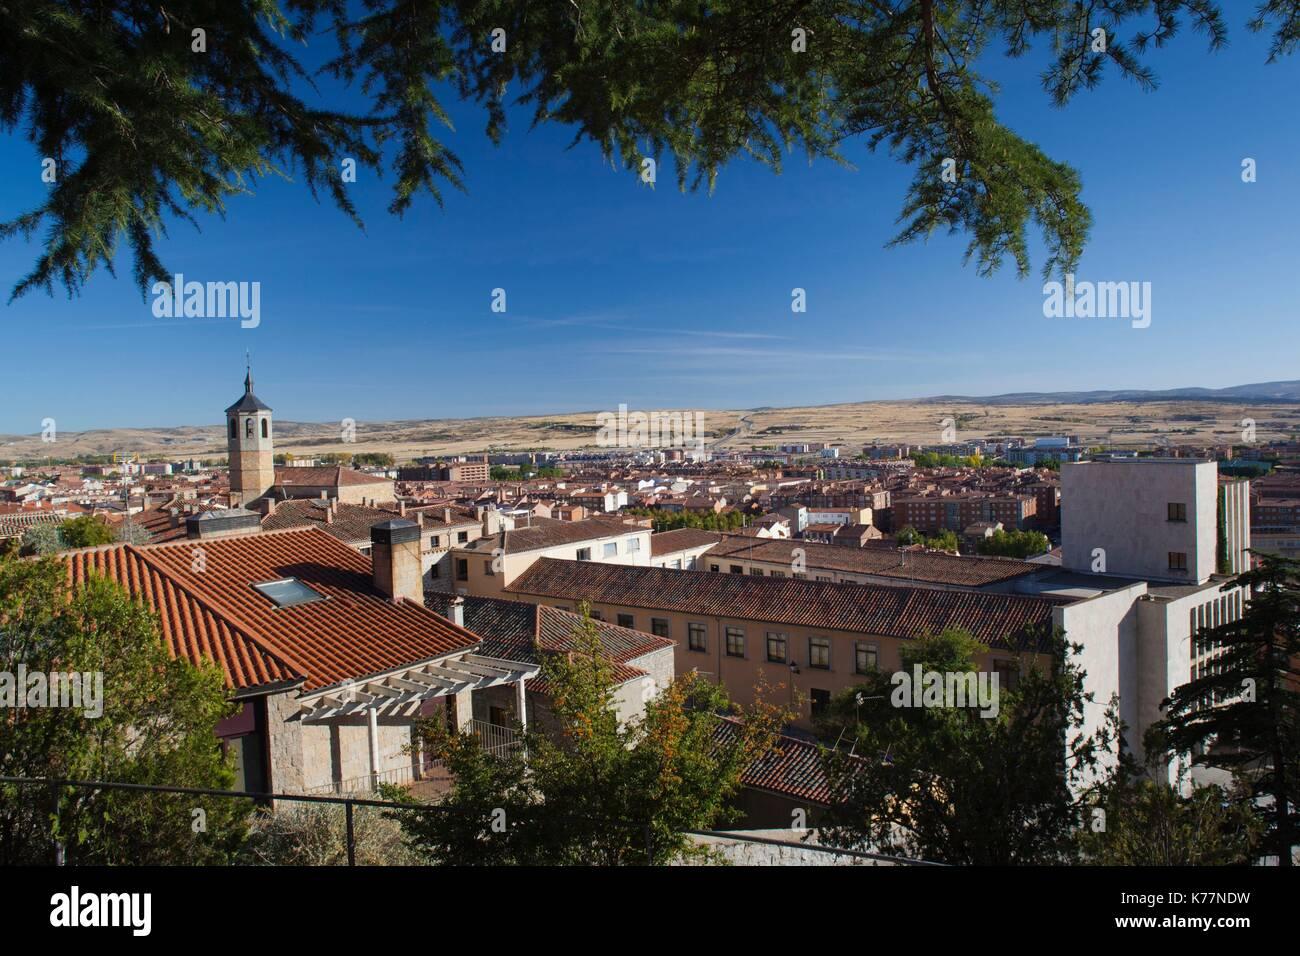 Spanien, Castilla y Leon Region, Provinz Avila, Avila, erhöhten Blick auf die Stadt vom Parque del Rastro Stockbild